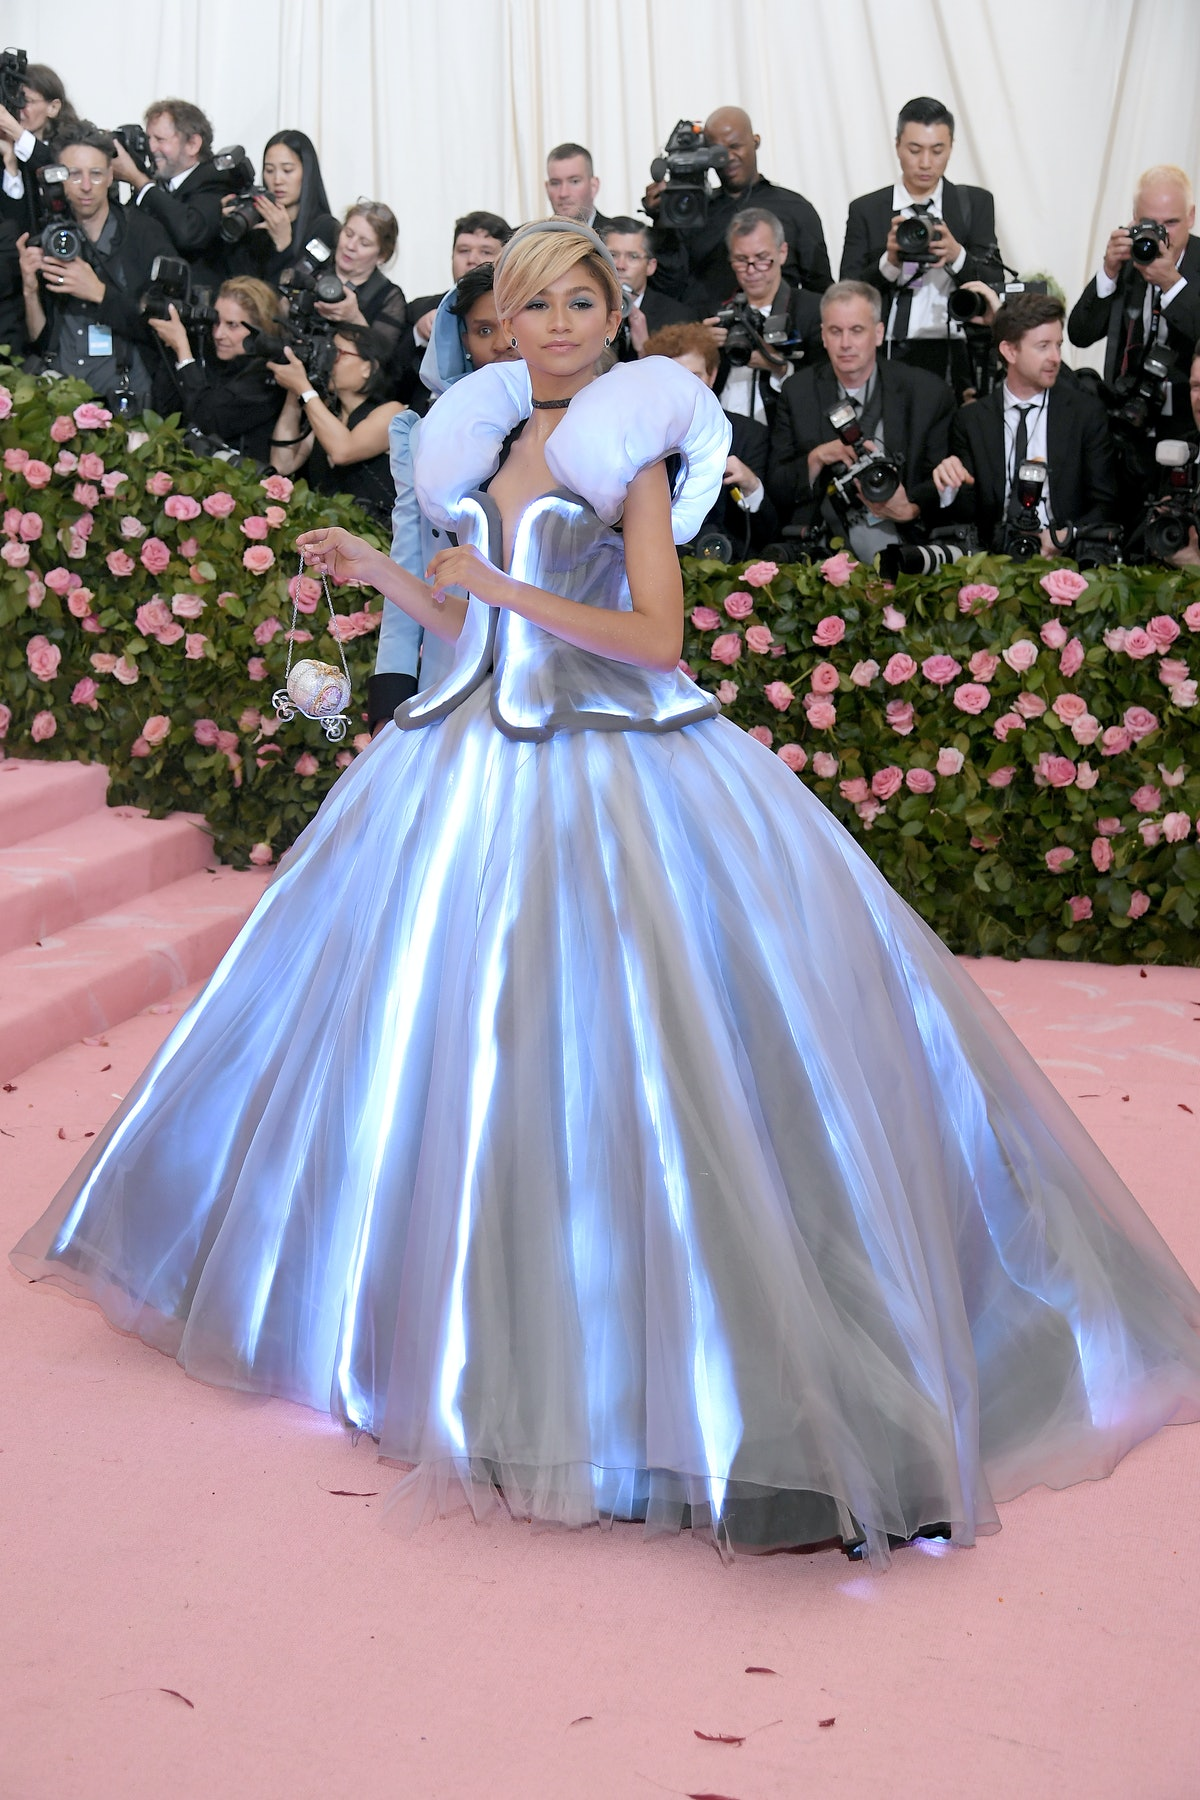 Zendaya attends The 2019 Met Gala Celebrating Camp: Notes on Fashion at Metropolitan Museum of Art o...